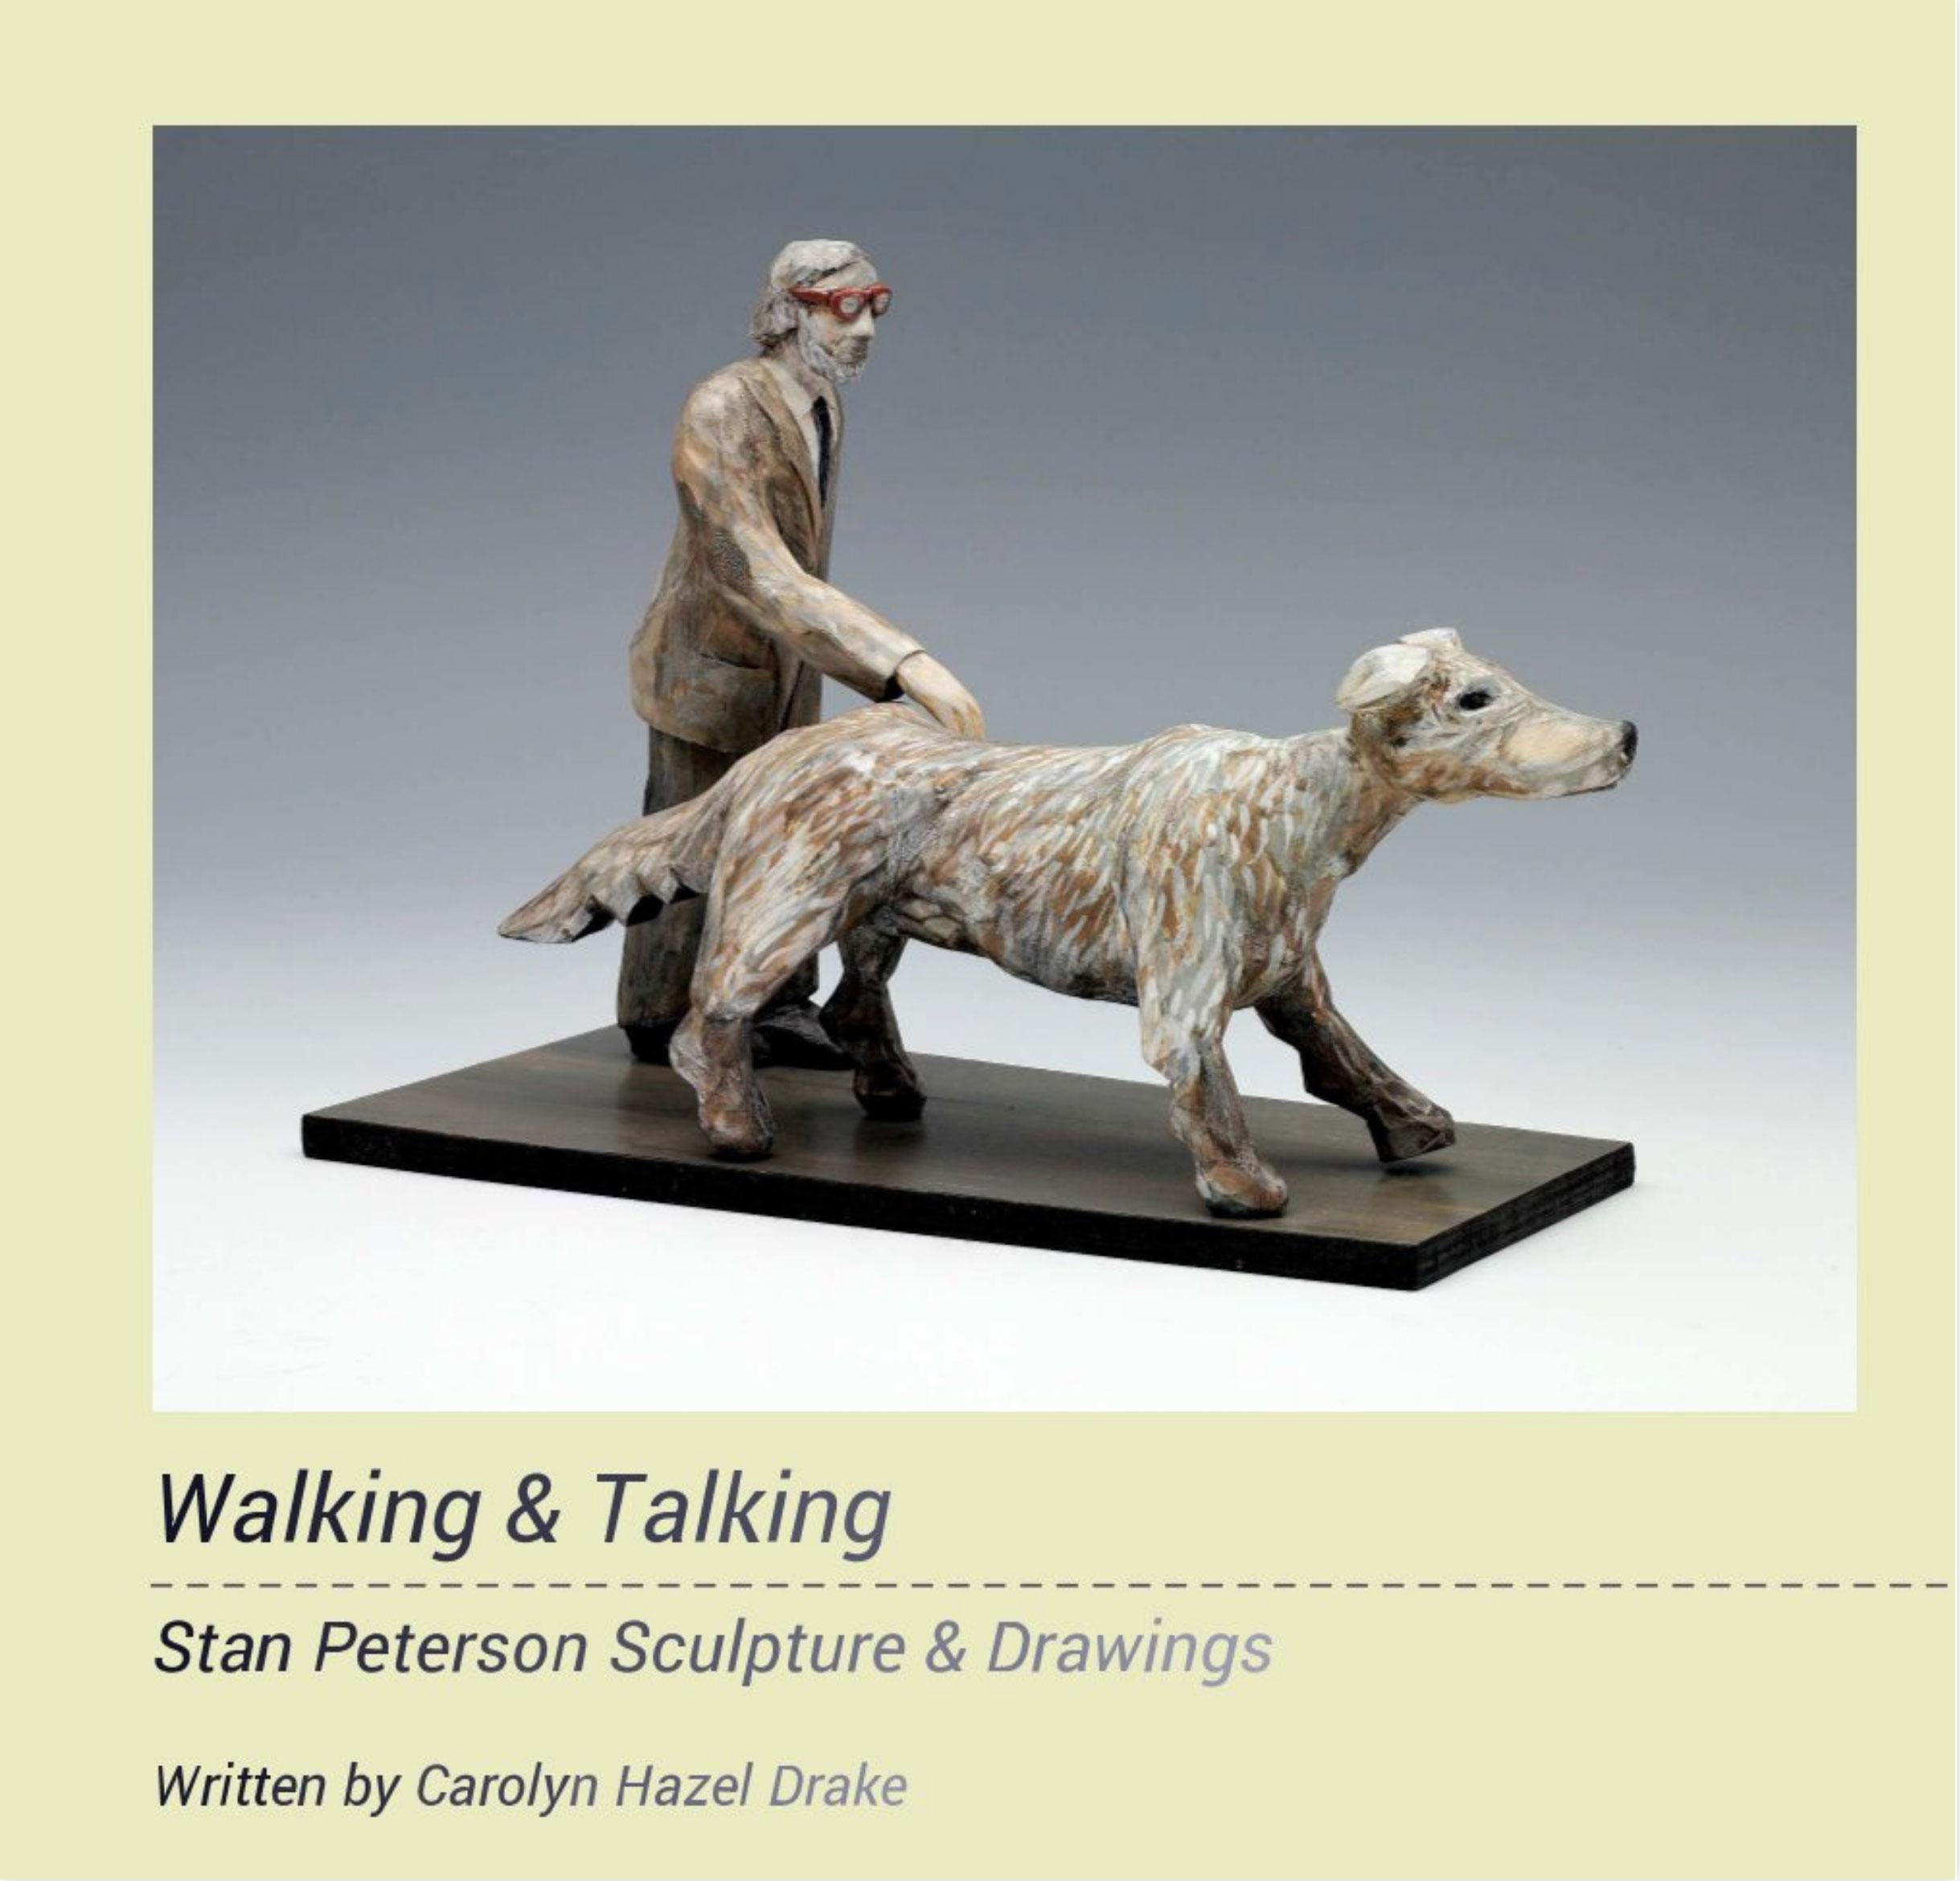 walkingtalking_001.jpg